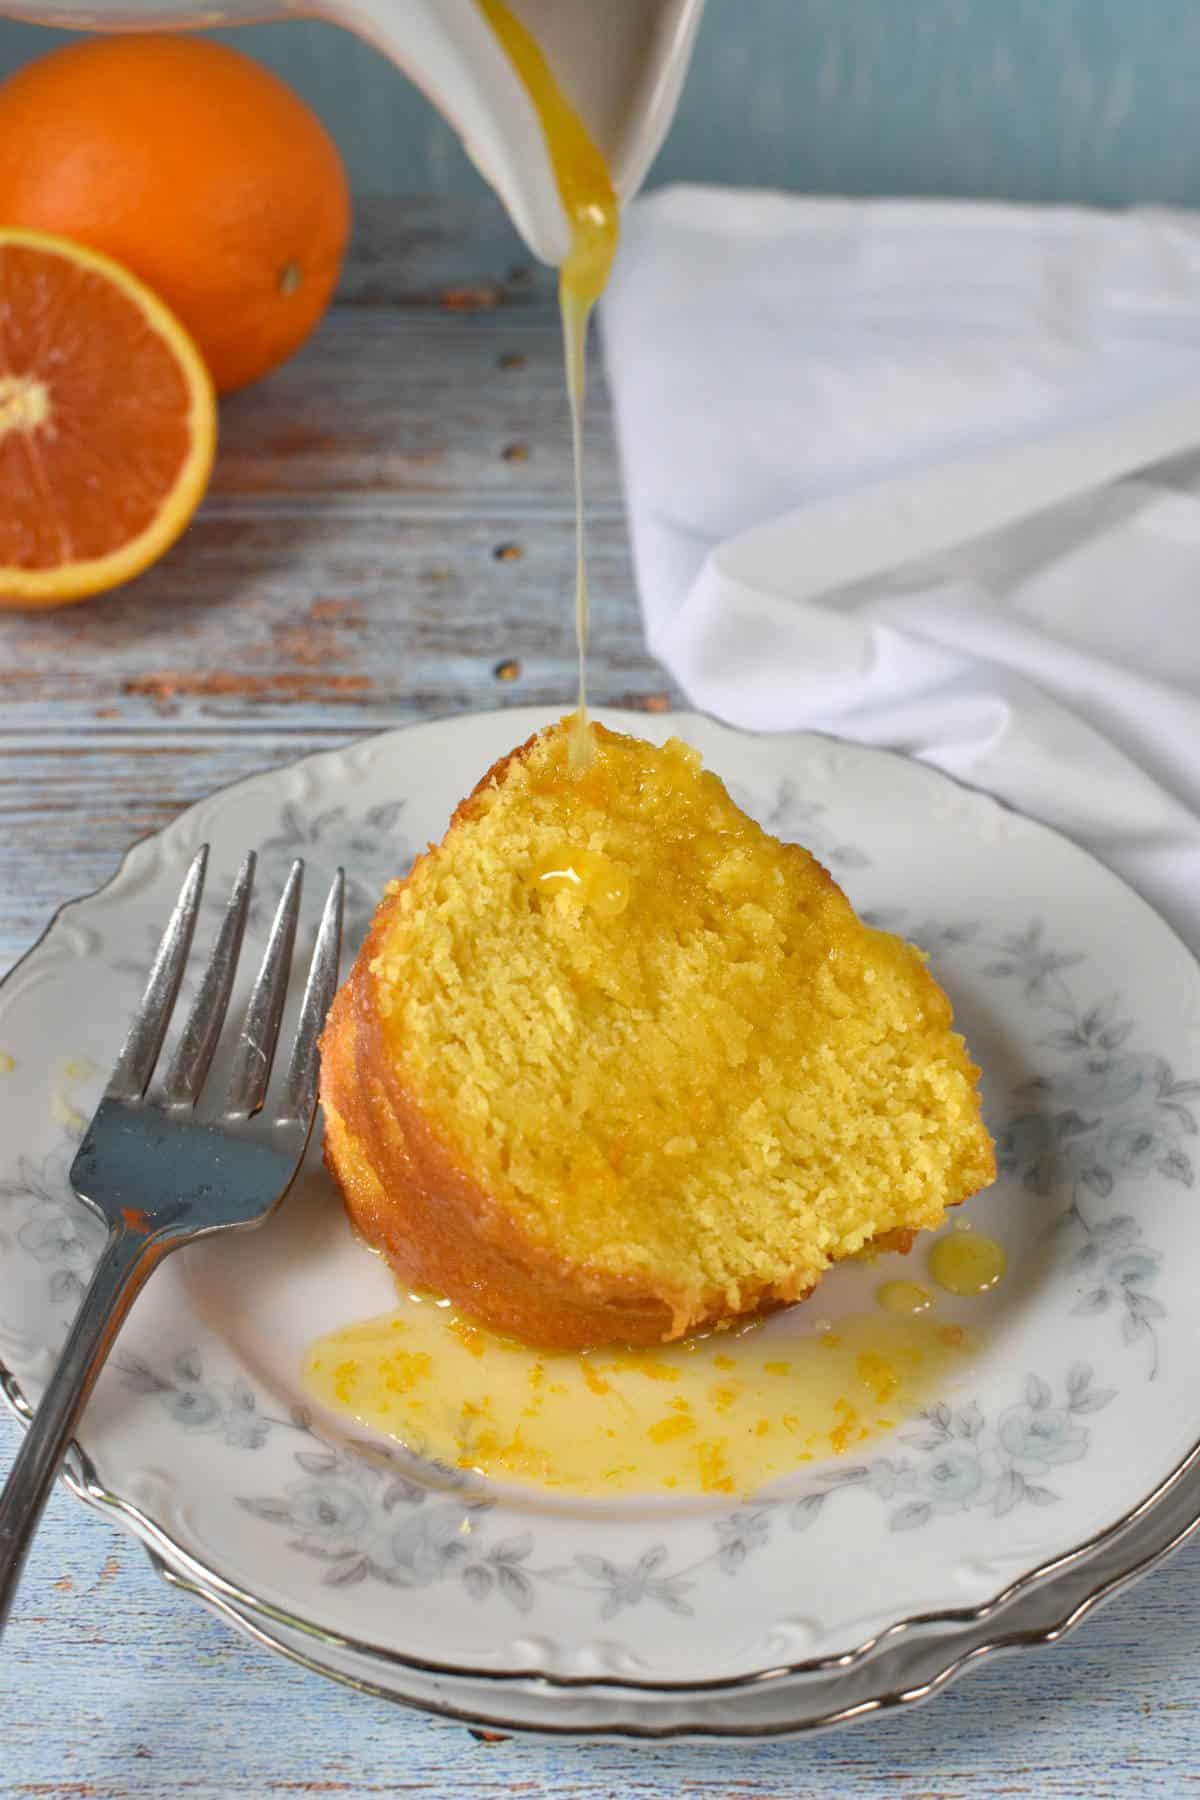 Derramando calda de laranja sobre uma fatia de bolo de laranja